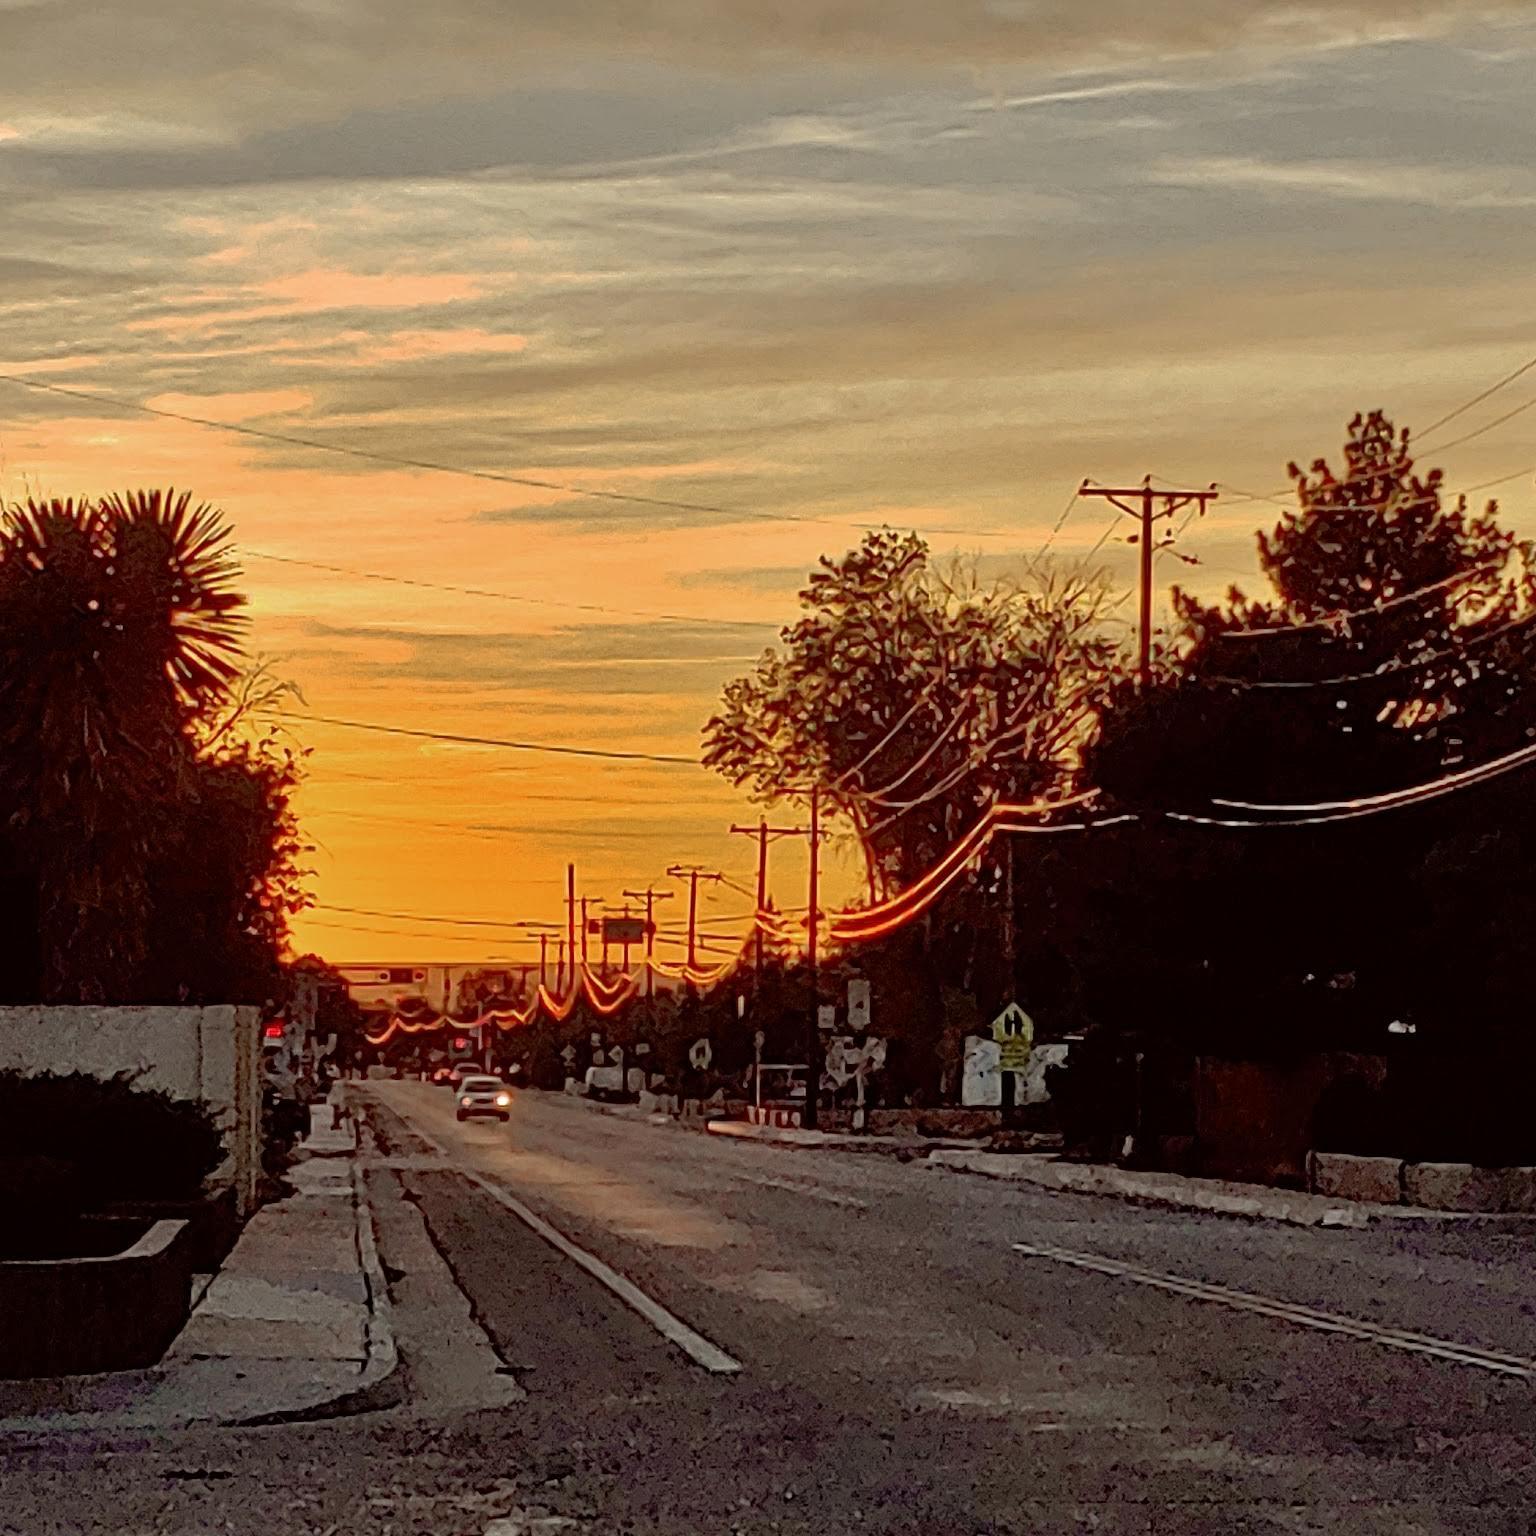 Sunset, ABQ